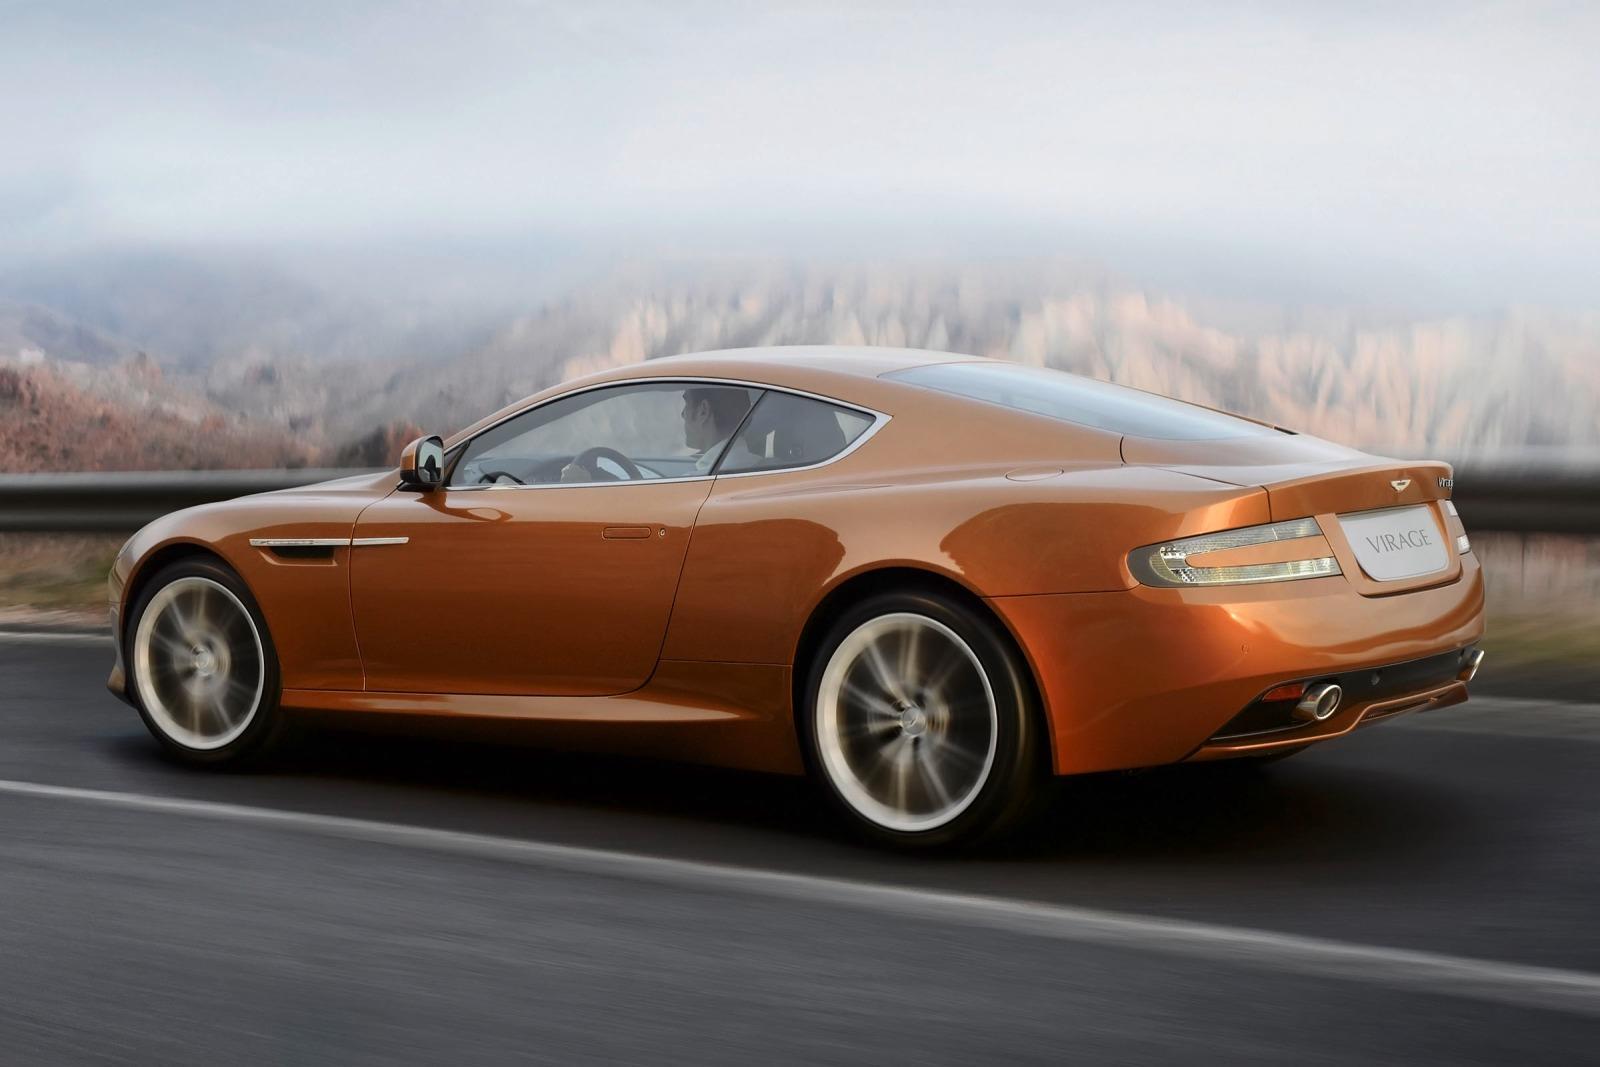 Aston Martin Virage II 2011 - 2012 Coupe #3